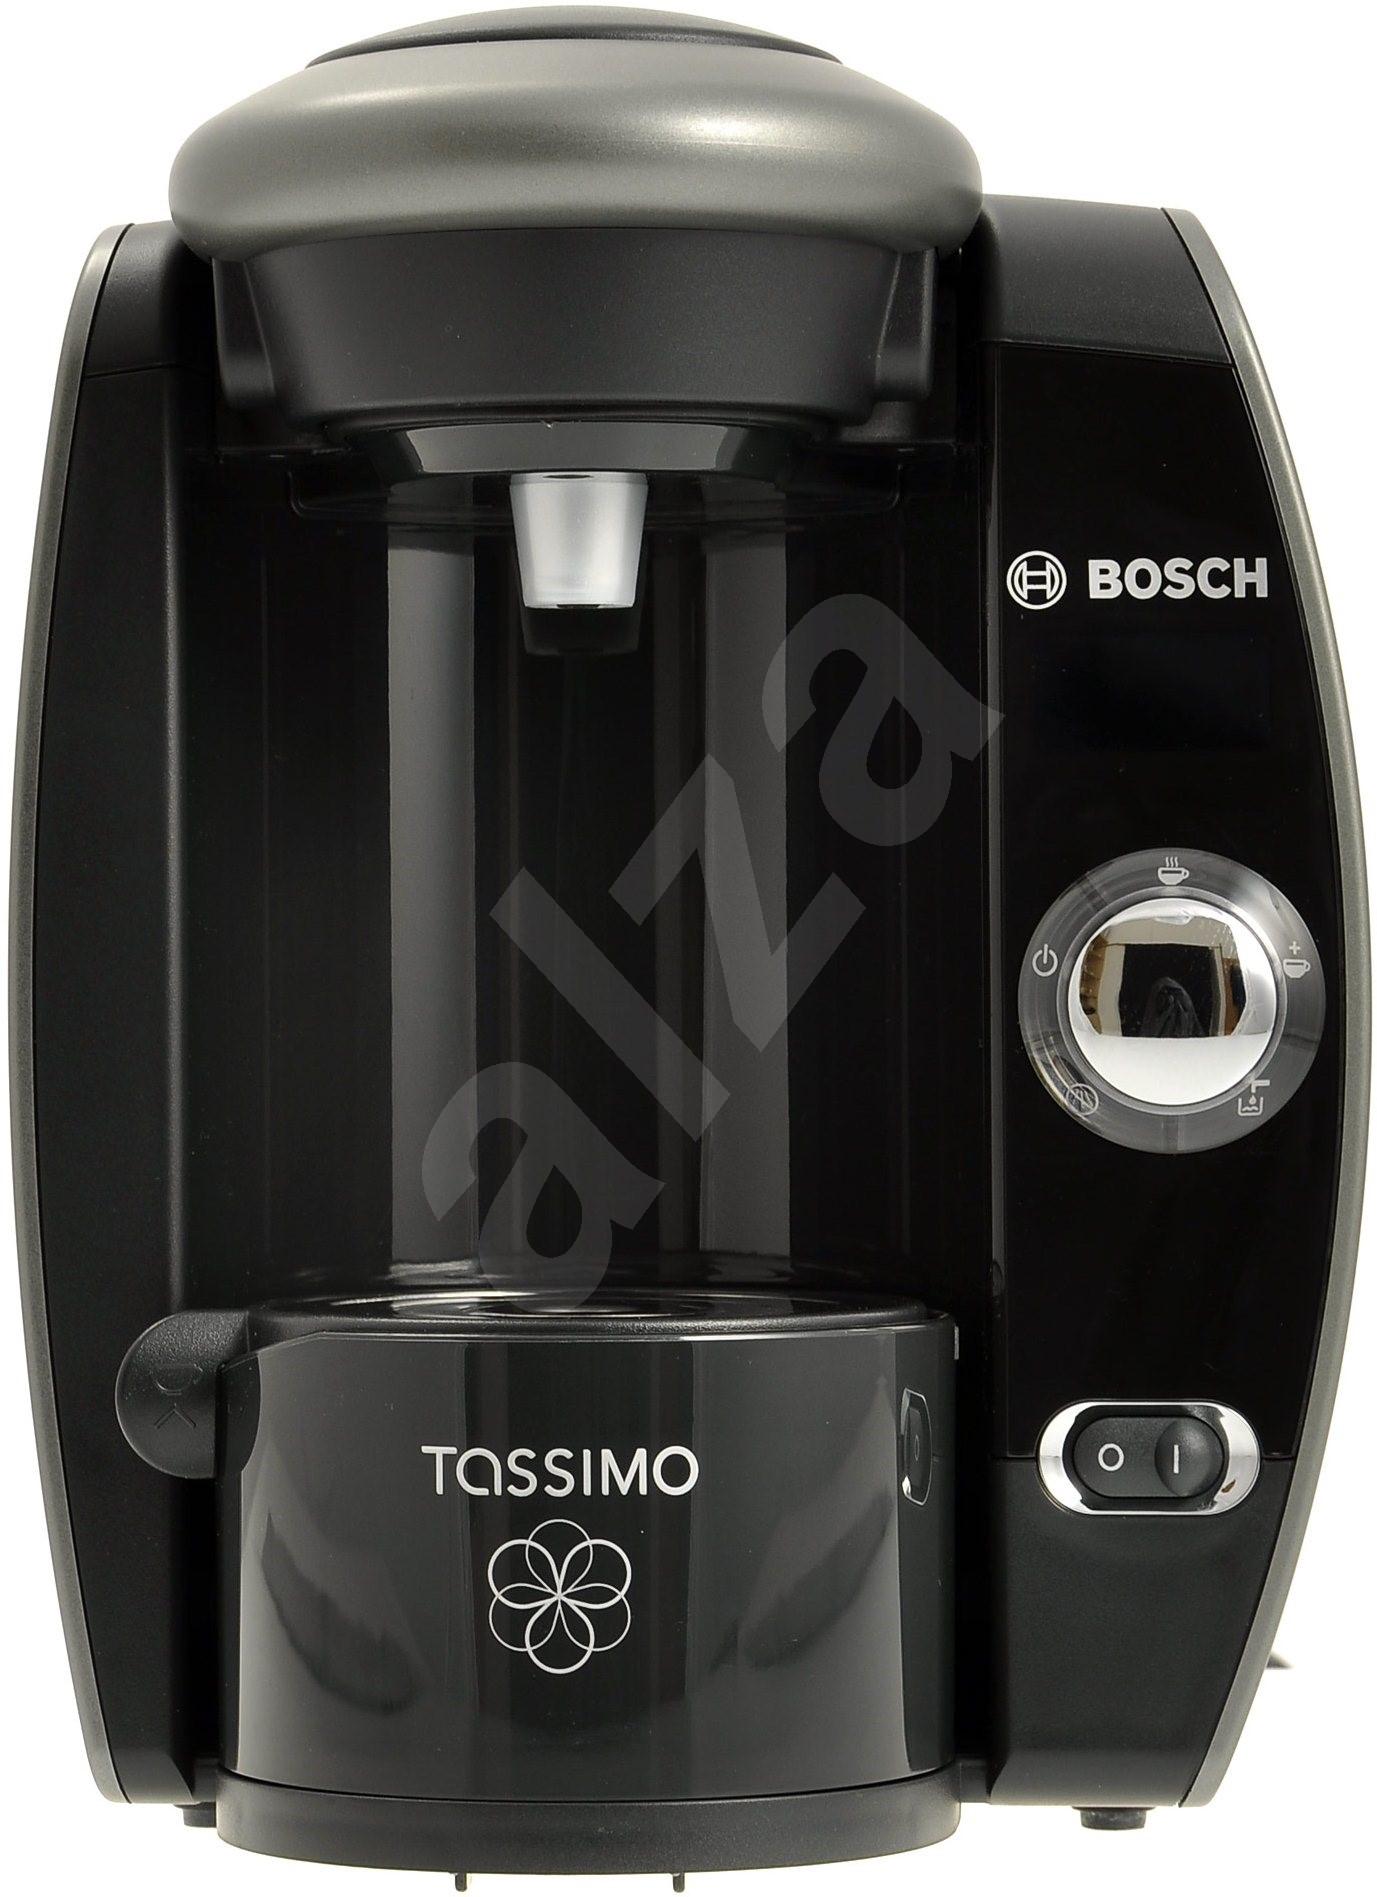 Bosch tassimo tas6515ee espresso - Tassimo vs dolce gusto ...